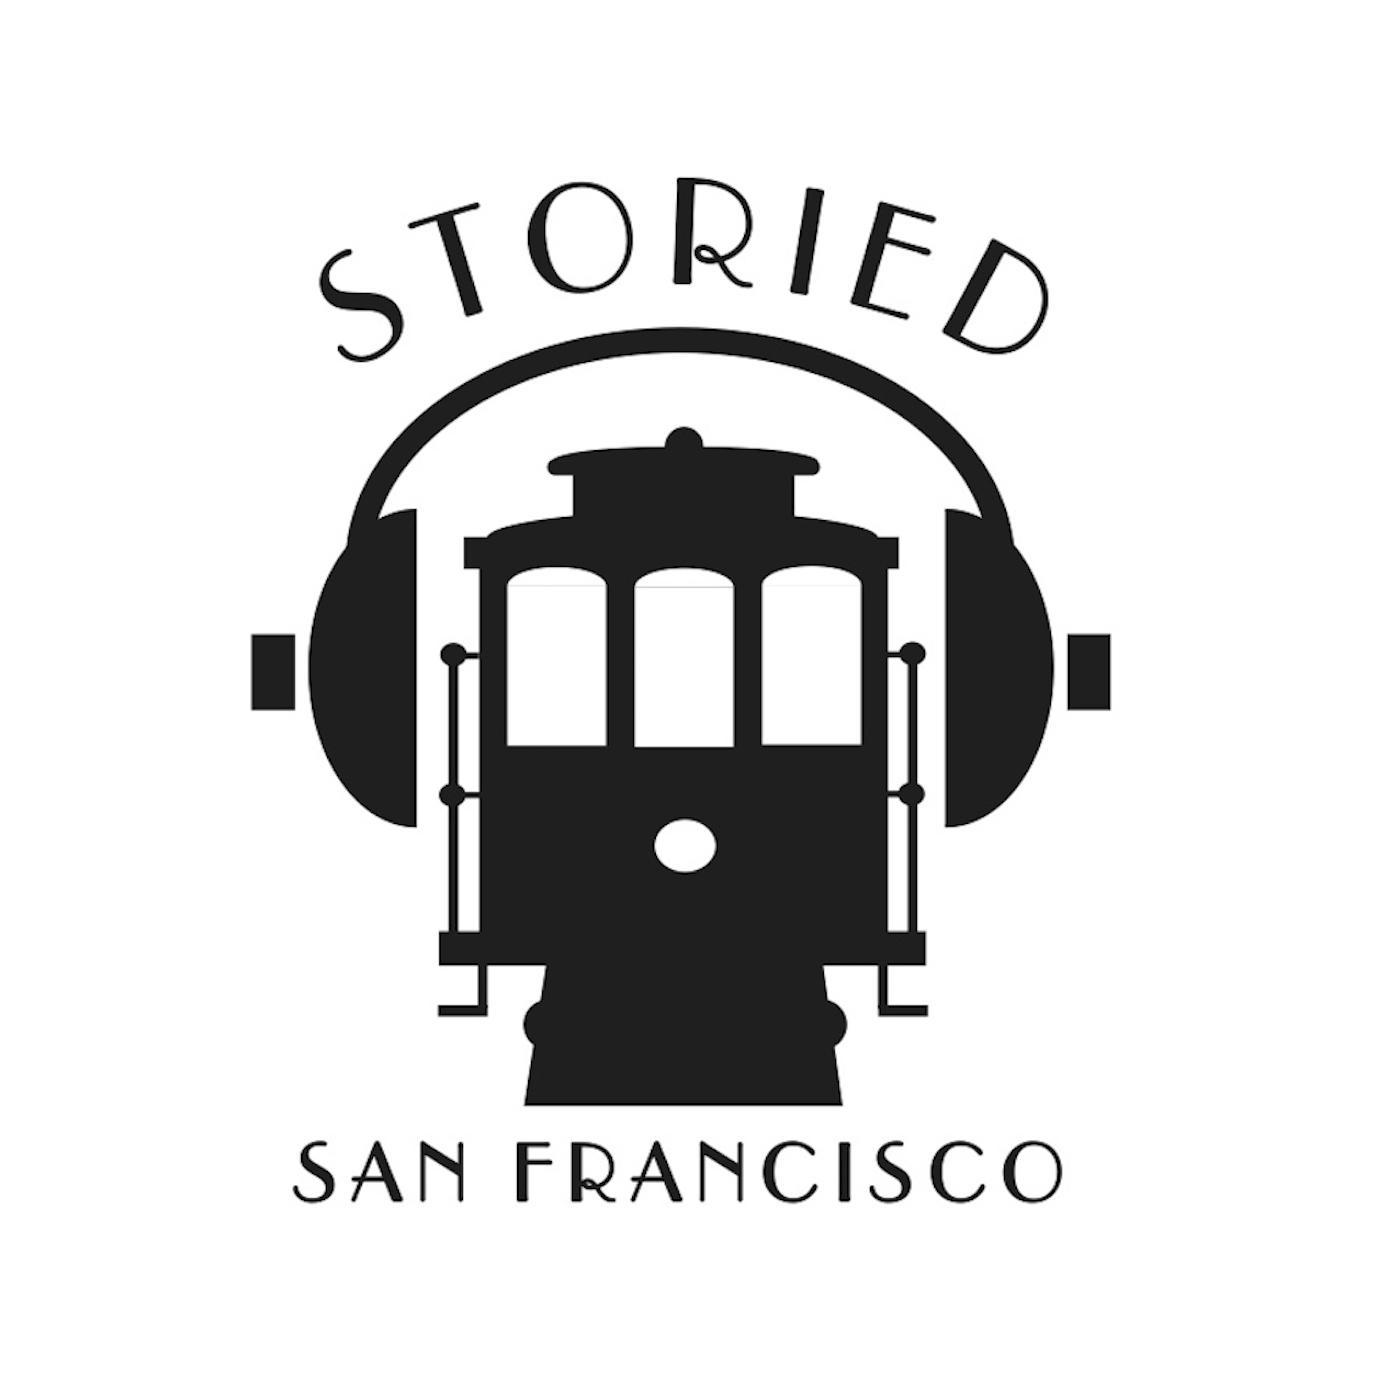 Storied: San Francisco show art